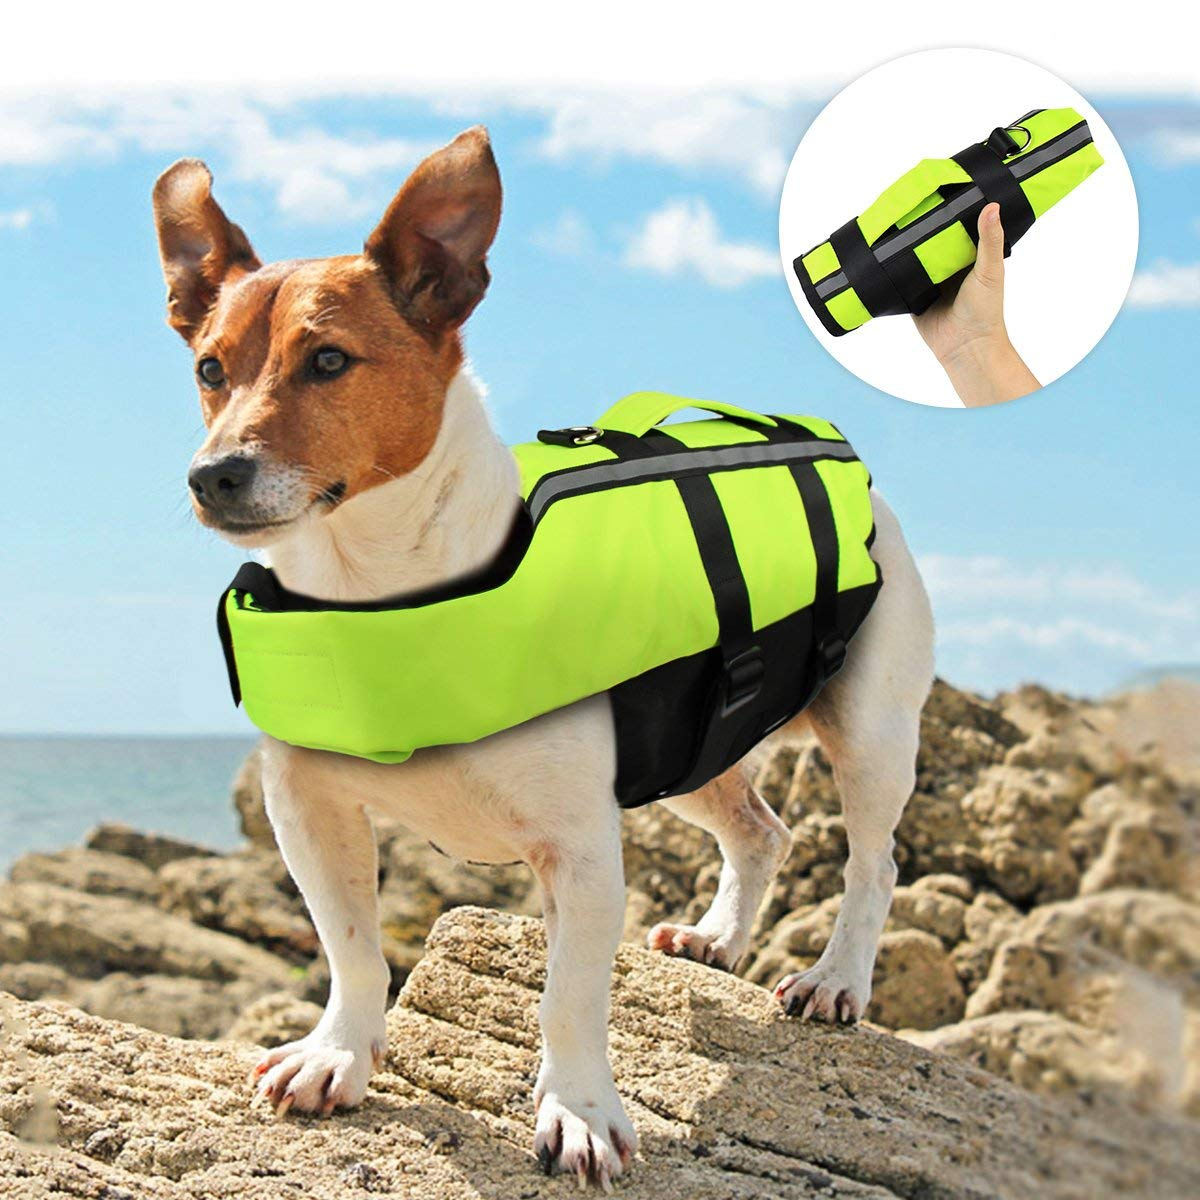 Namsan Dog Life Jacket - Folding Dog Life Vest,Portable Airbag Dog Swimming Jacket Vest,Green,Small